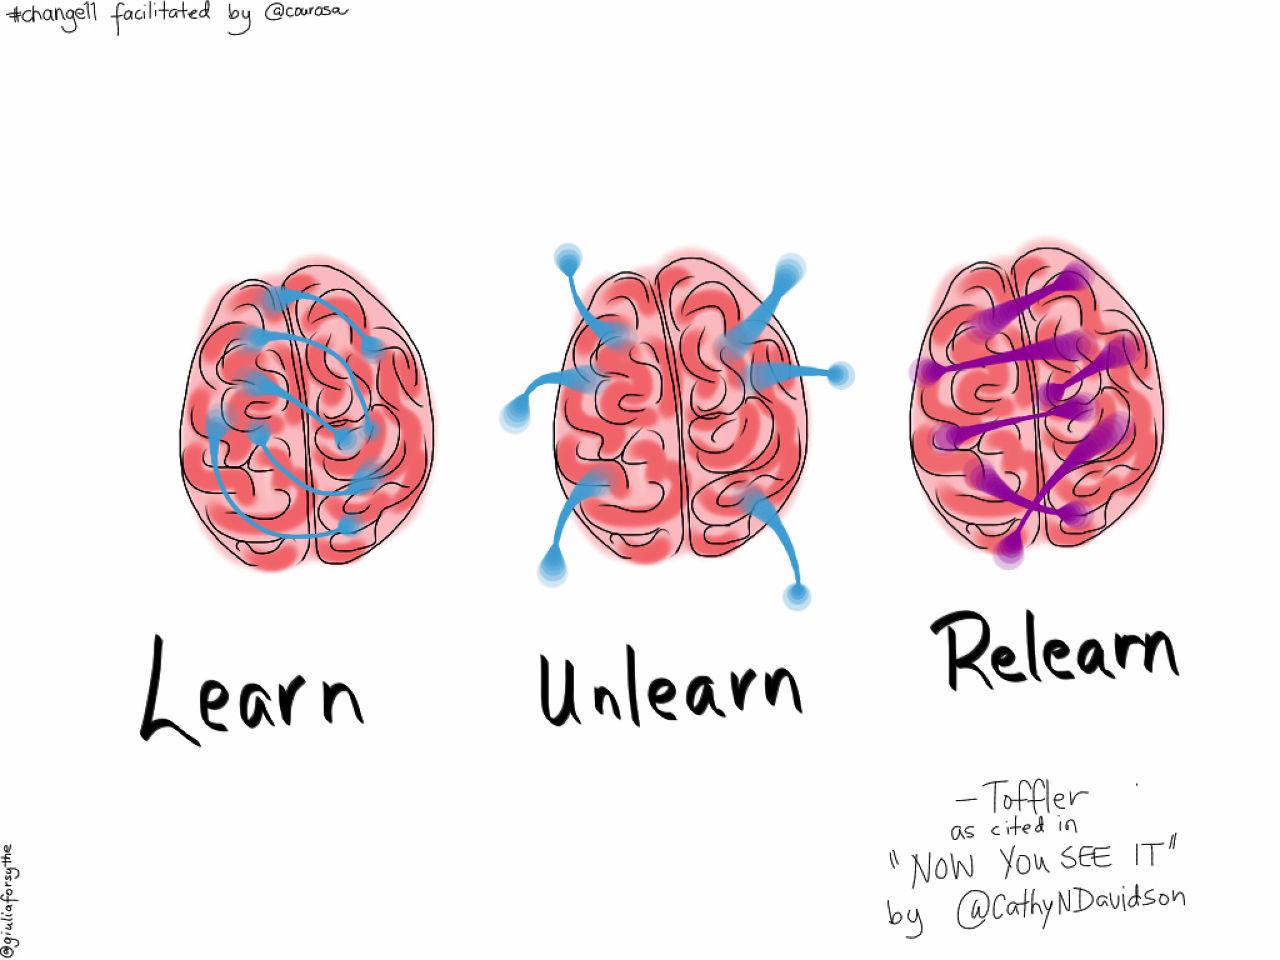 Relearning.jpg